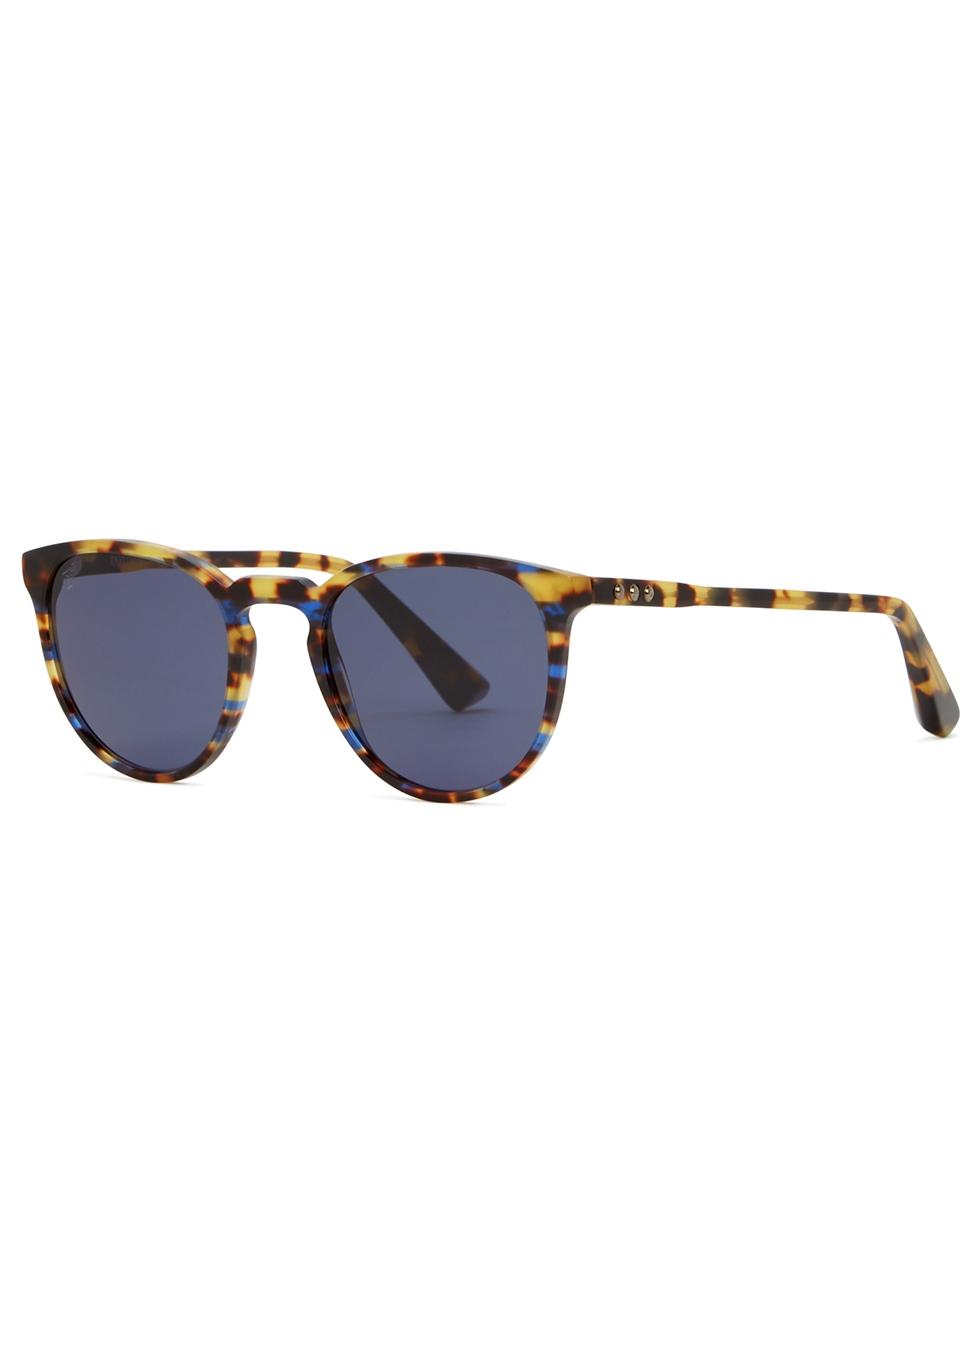 TAYLOR MORRIS EYEWEAR George Arthur C7 Round-Frame Sunglasses in Tortoise